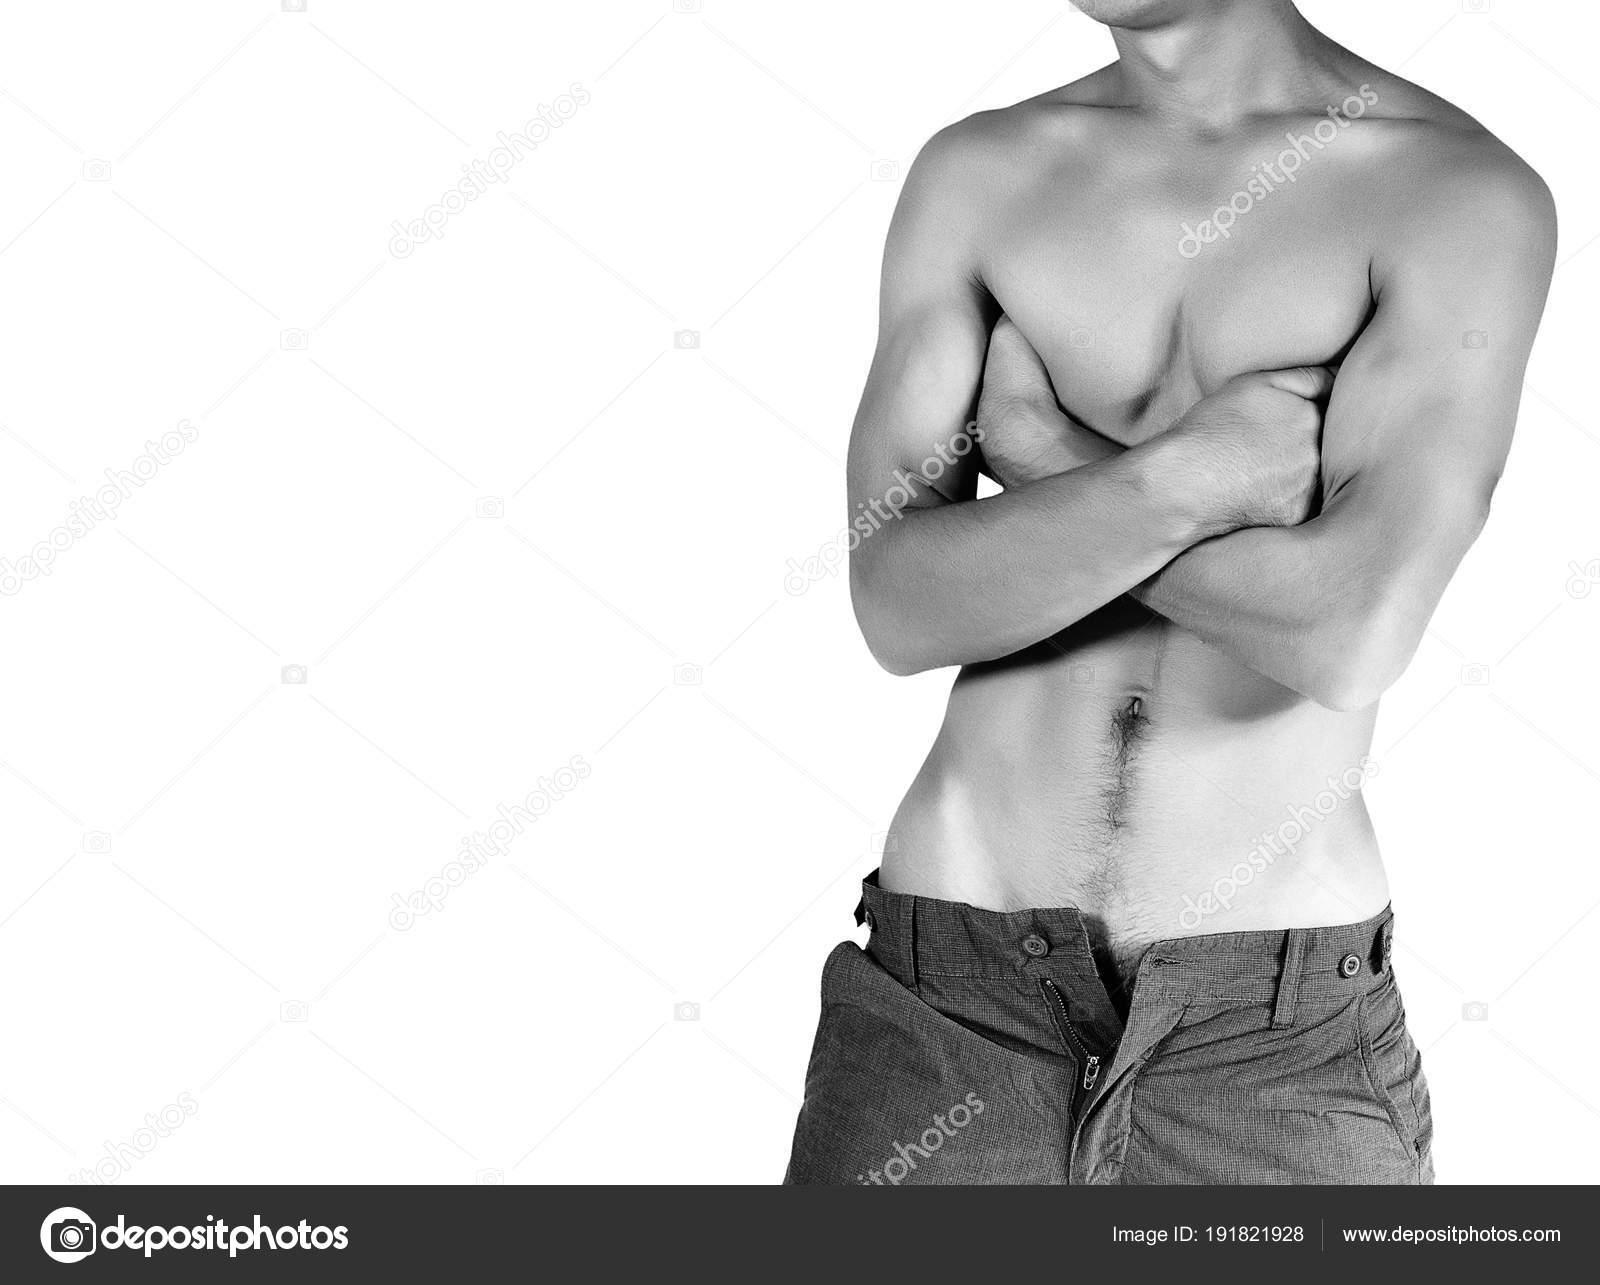 My ex girlfriend had sex nude